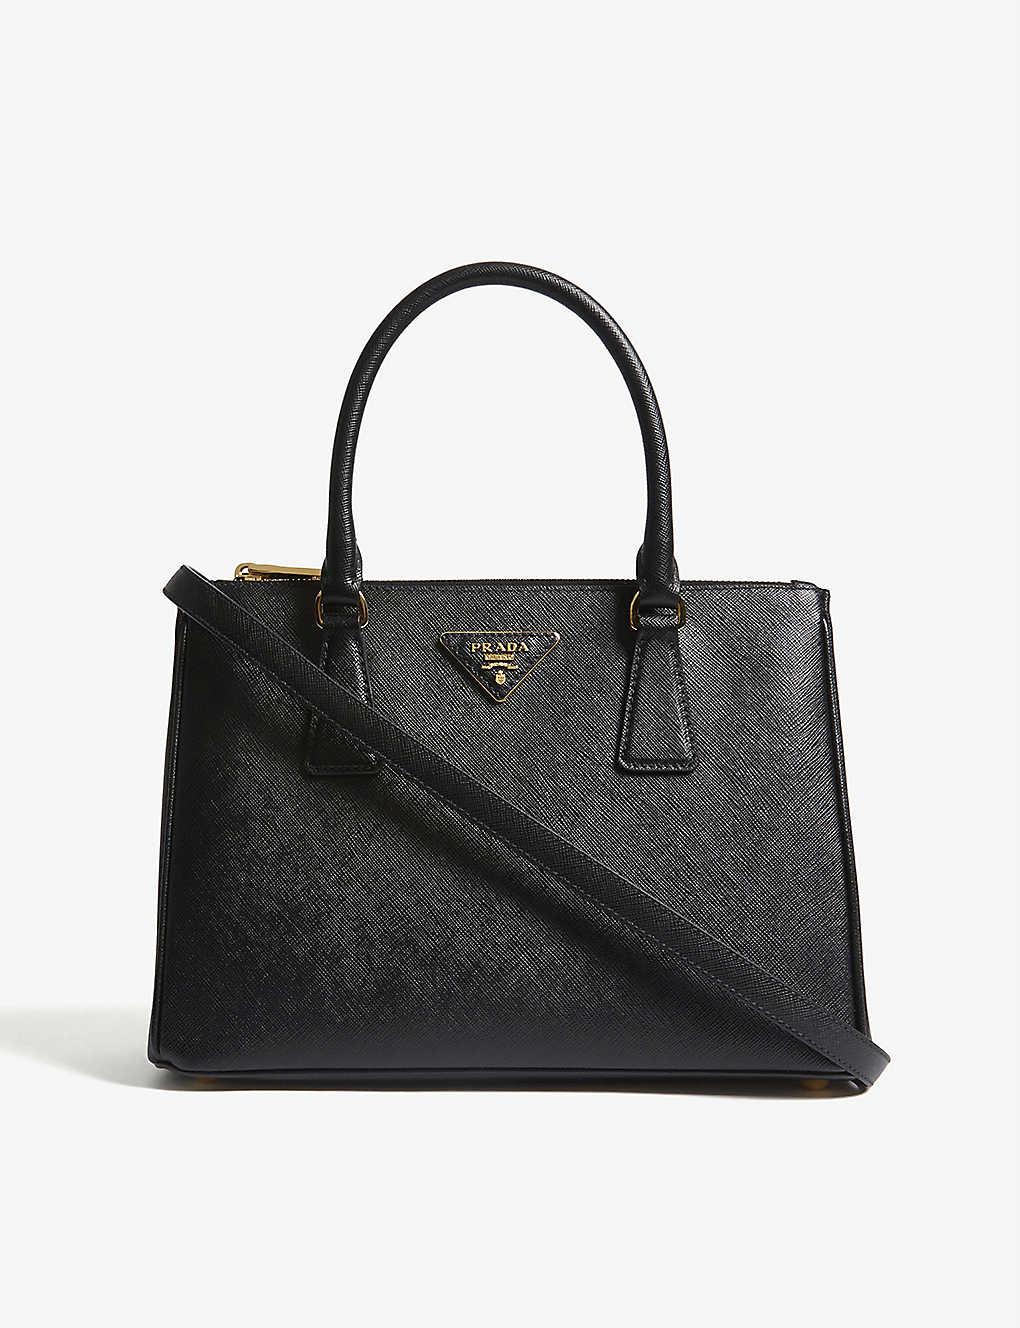 82c8a36e29 PRADA - Galleria medium leather tote | Selfridges.com